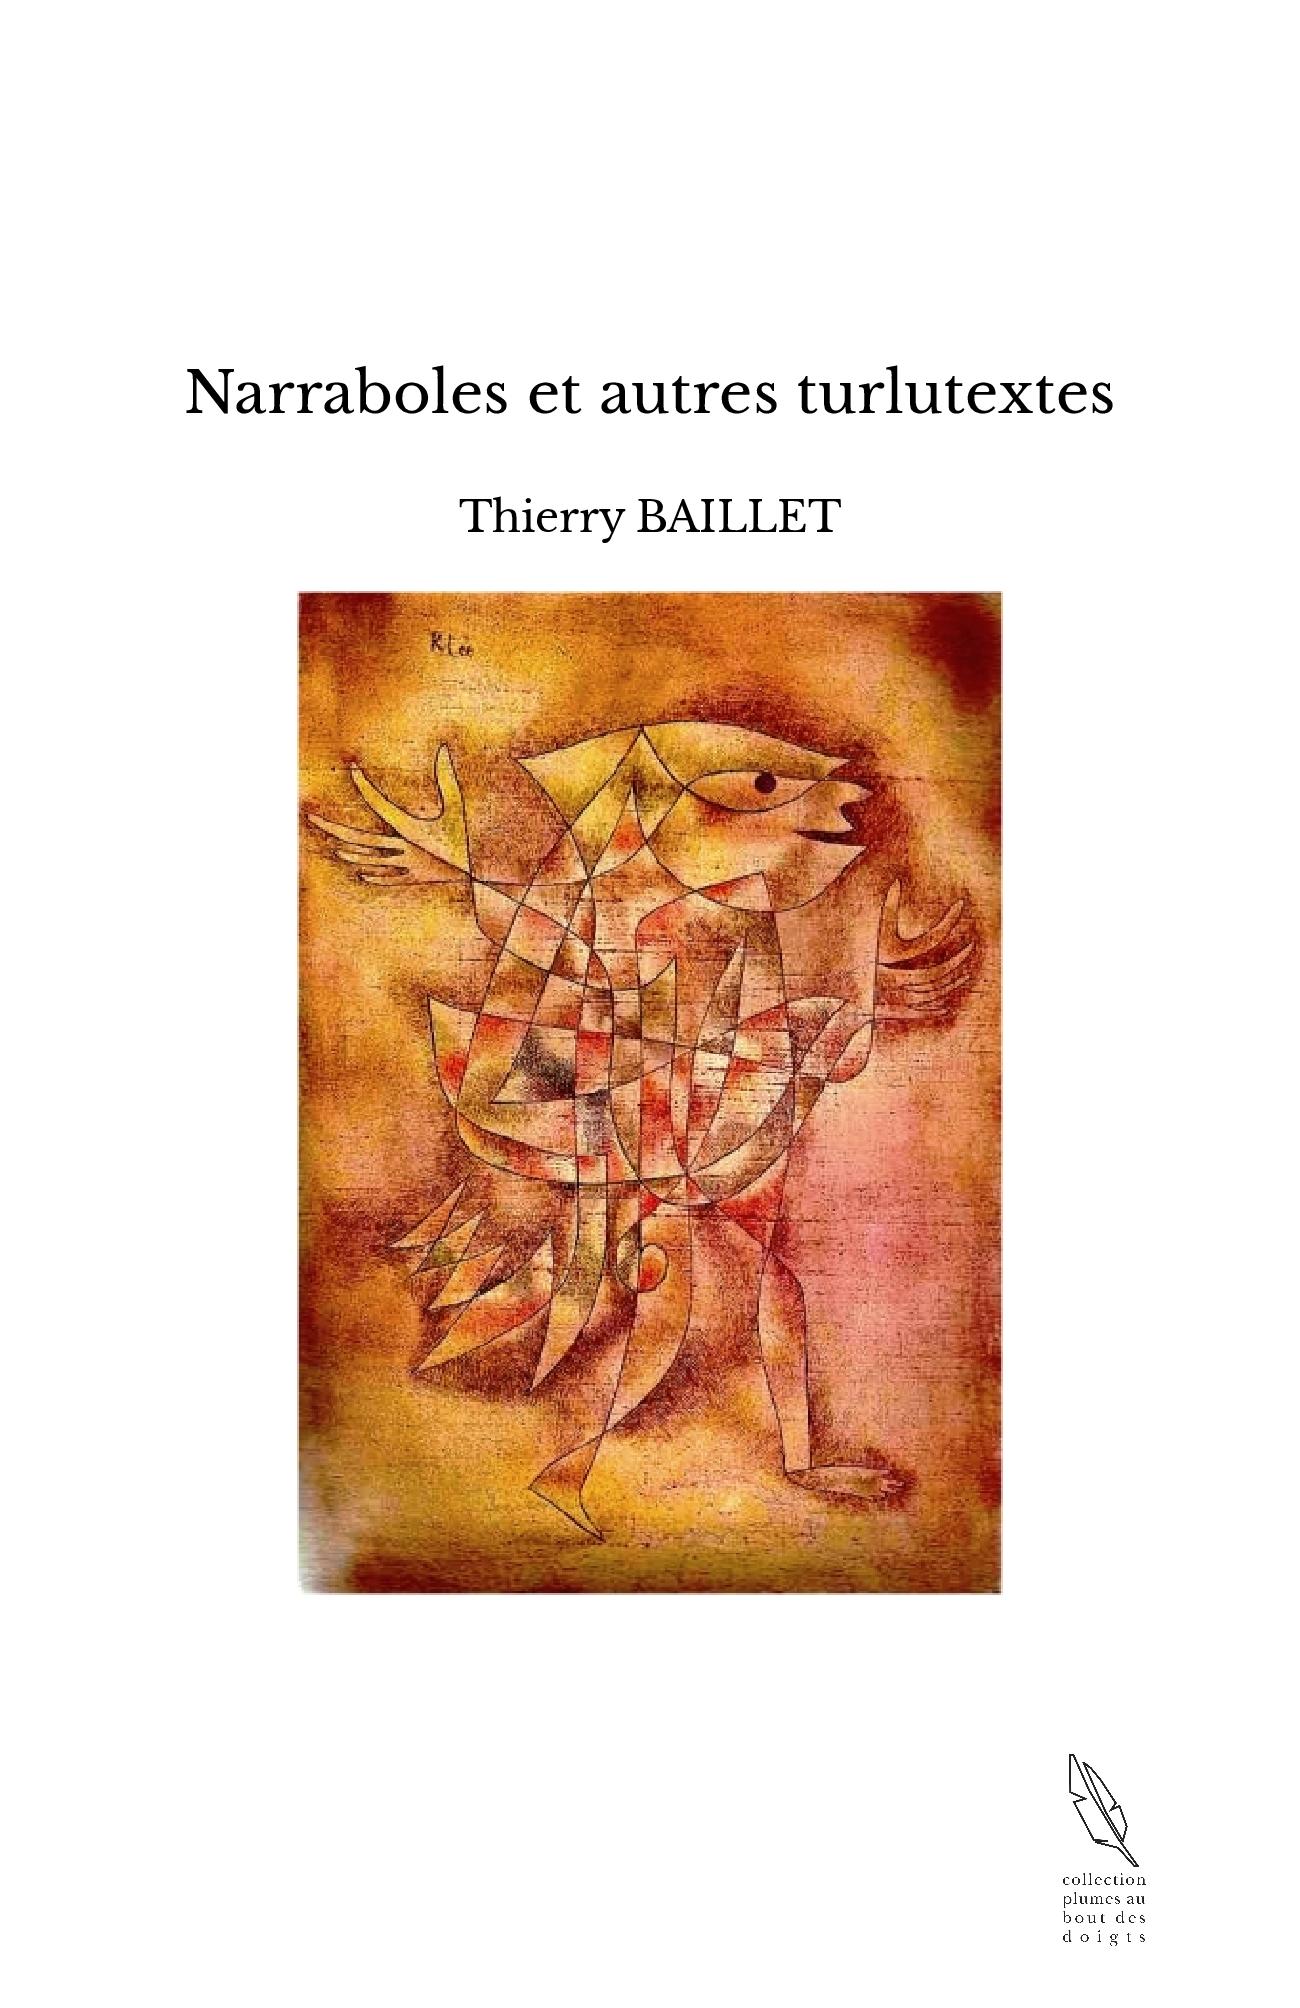 Narraboles et autres turlutextes